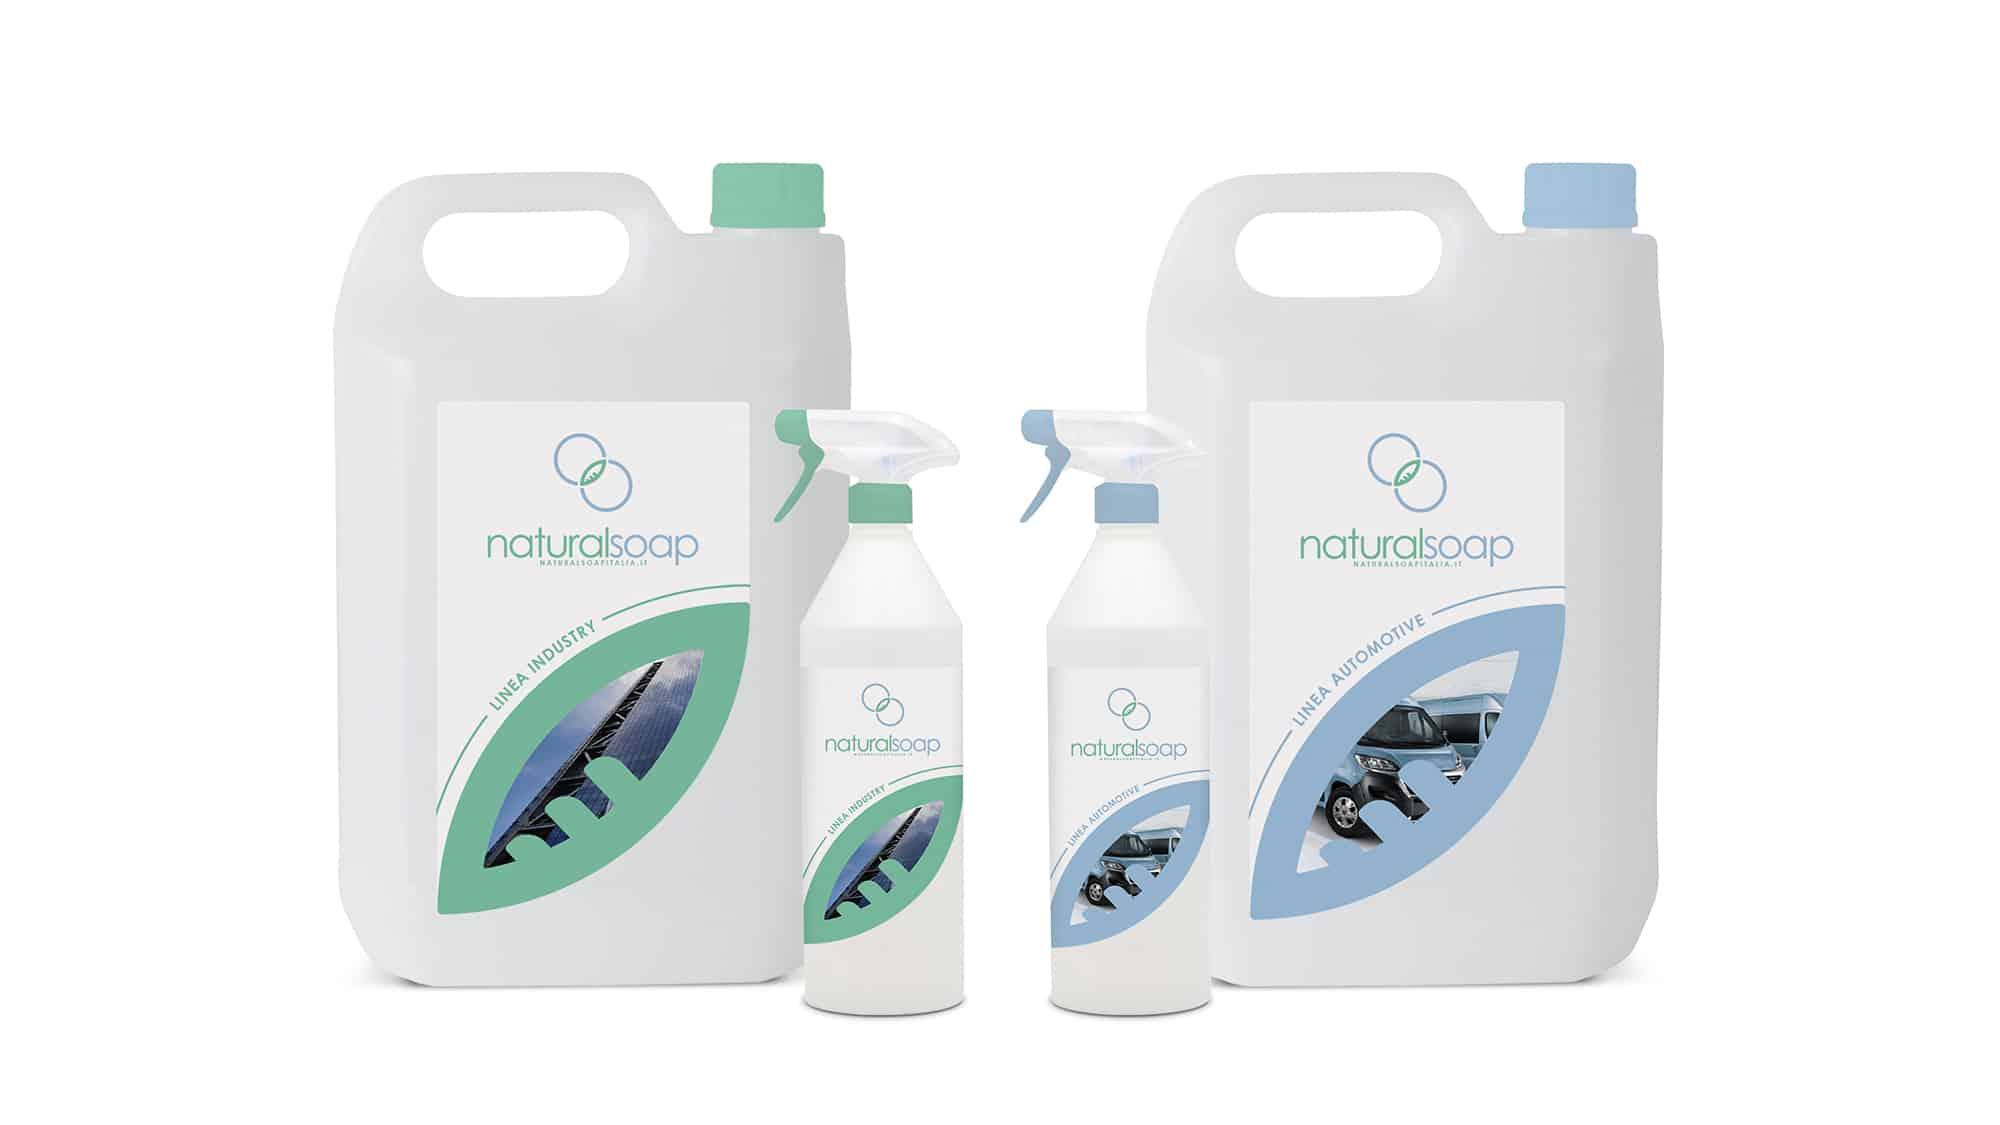 naturalsoap-prodotti-automotive-industry